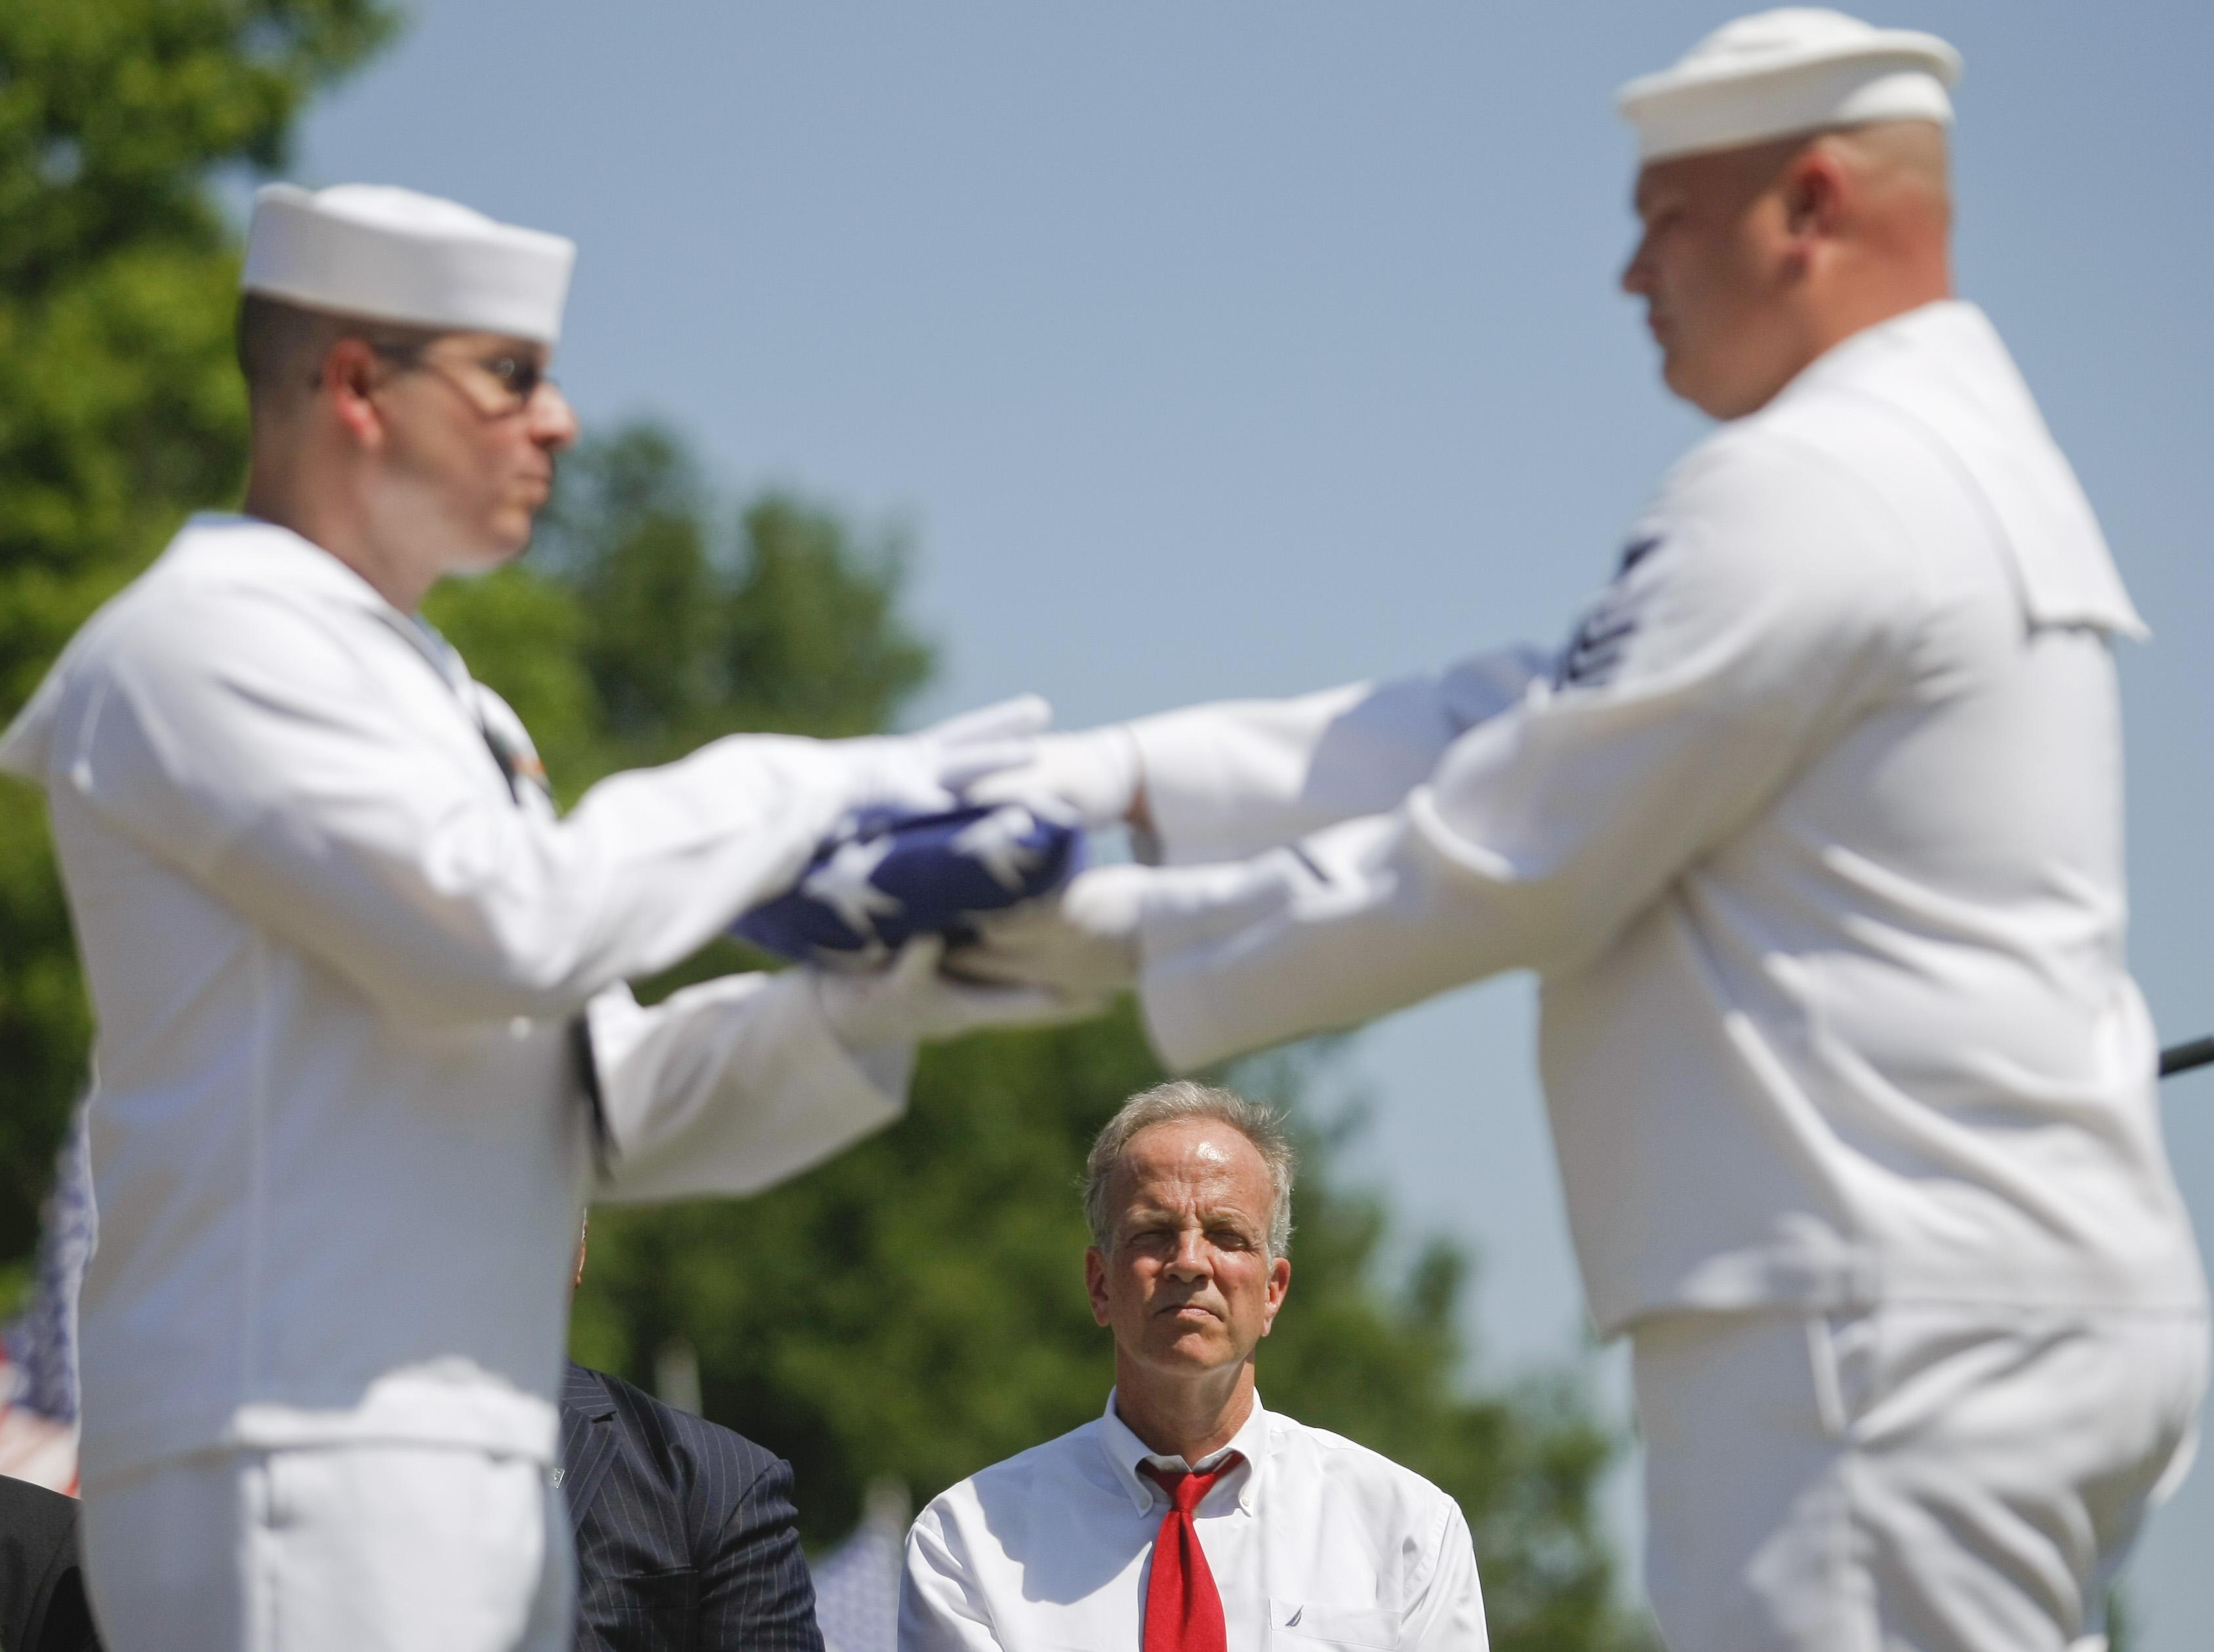 Sen. Moran Delivers Remarks at Wichita Memorial Day Service